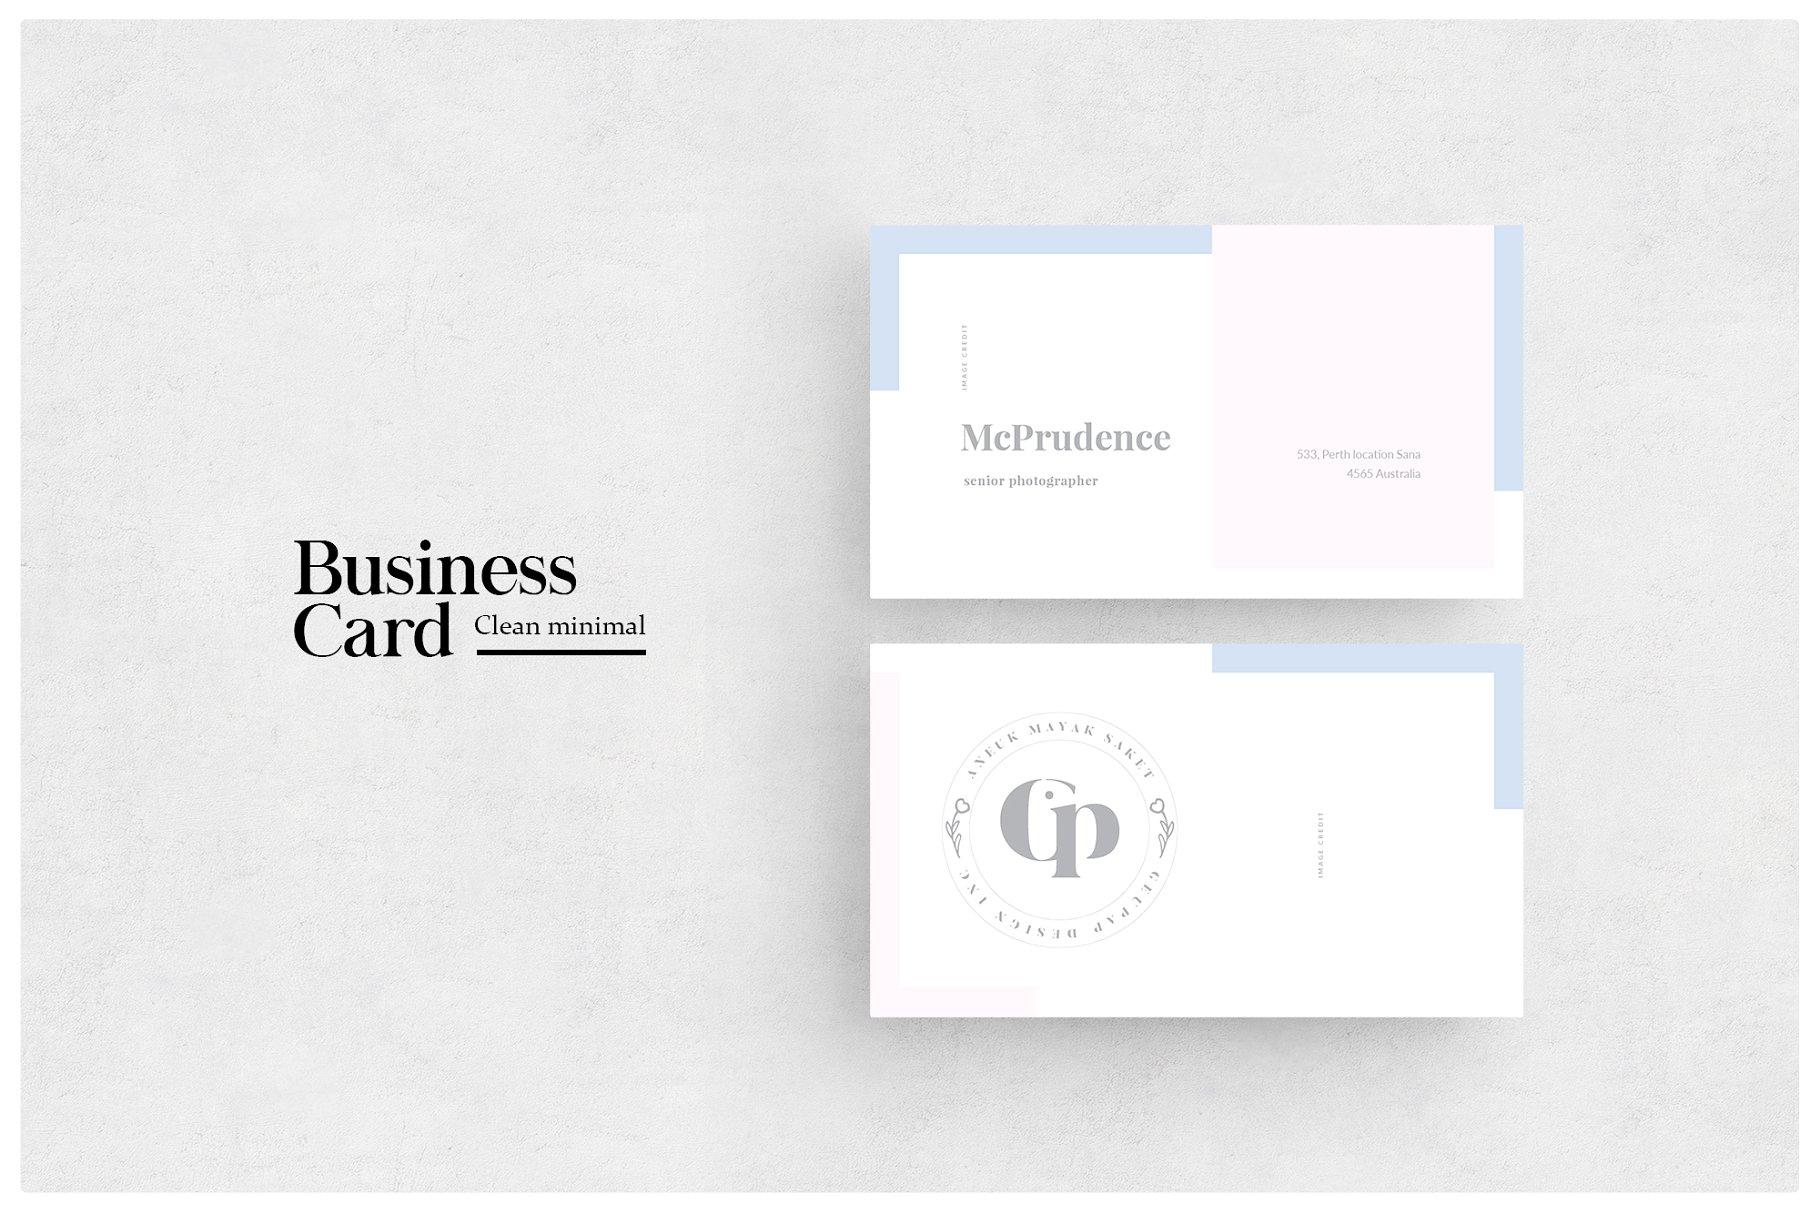 business-card-1-13.jpg